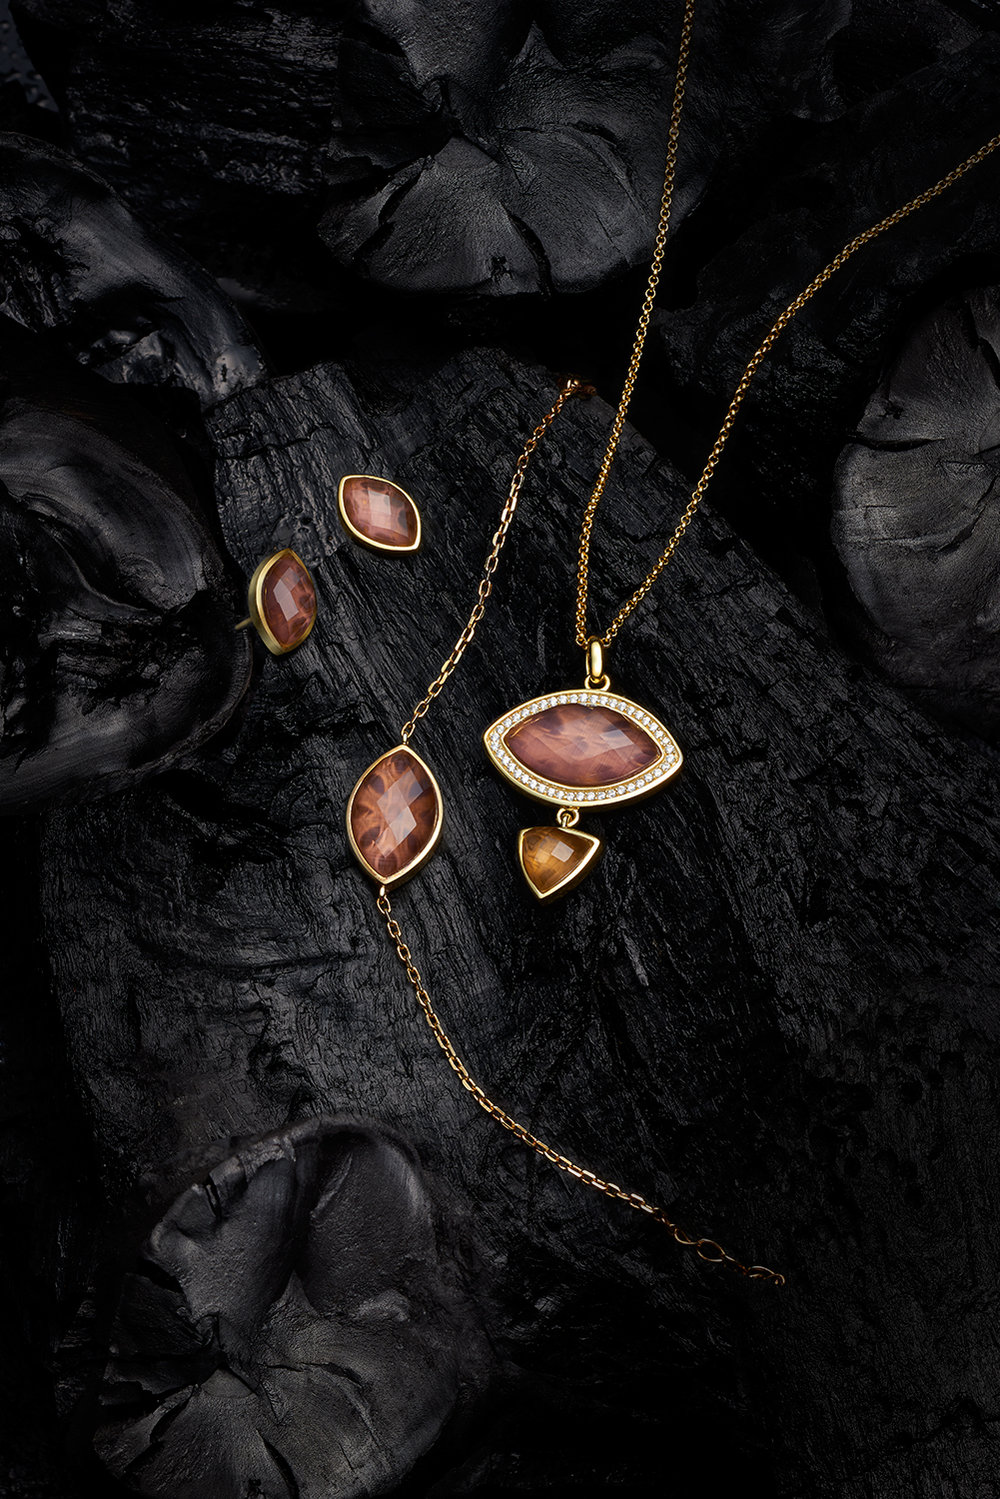 e-Jewellery-June-20174850-main.jpg